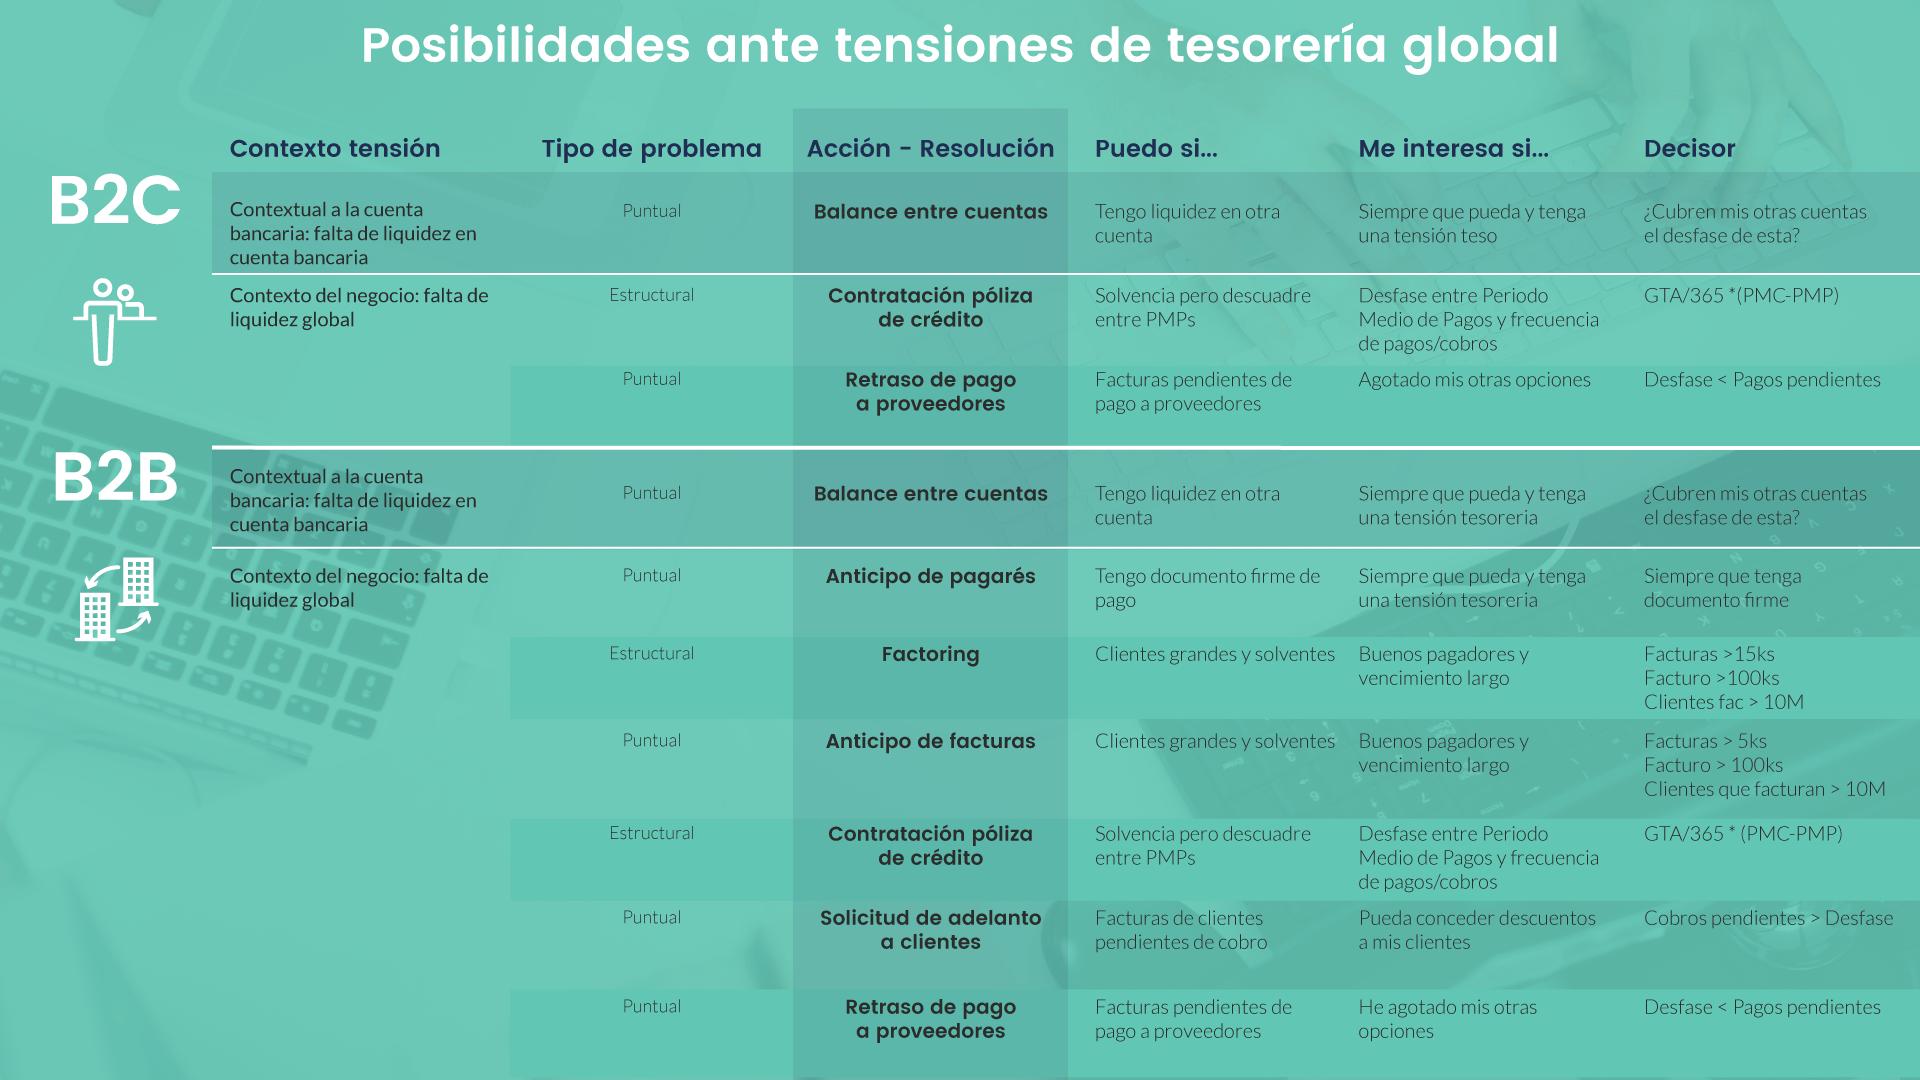 Fuentes de financiación, Tesorería global, árbol de decisión